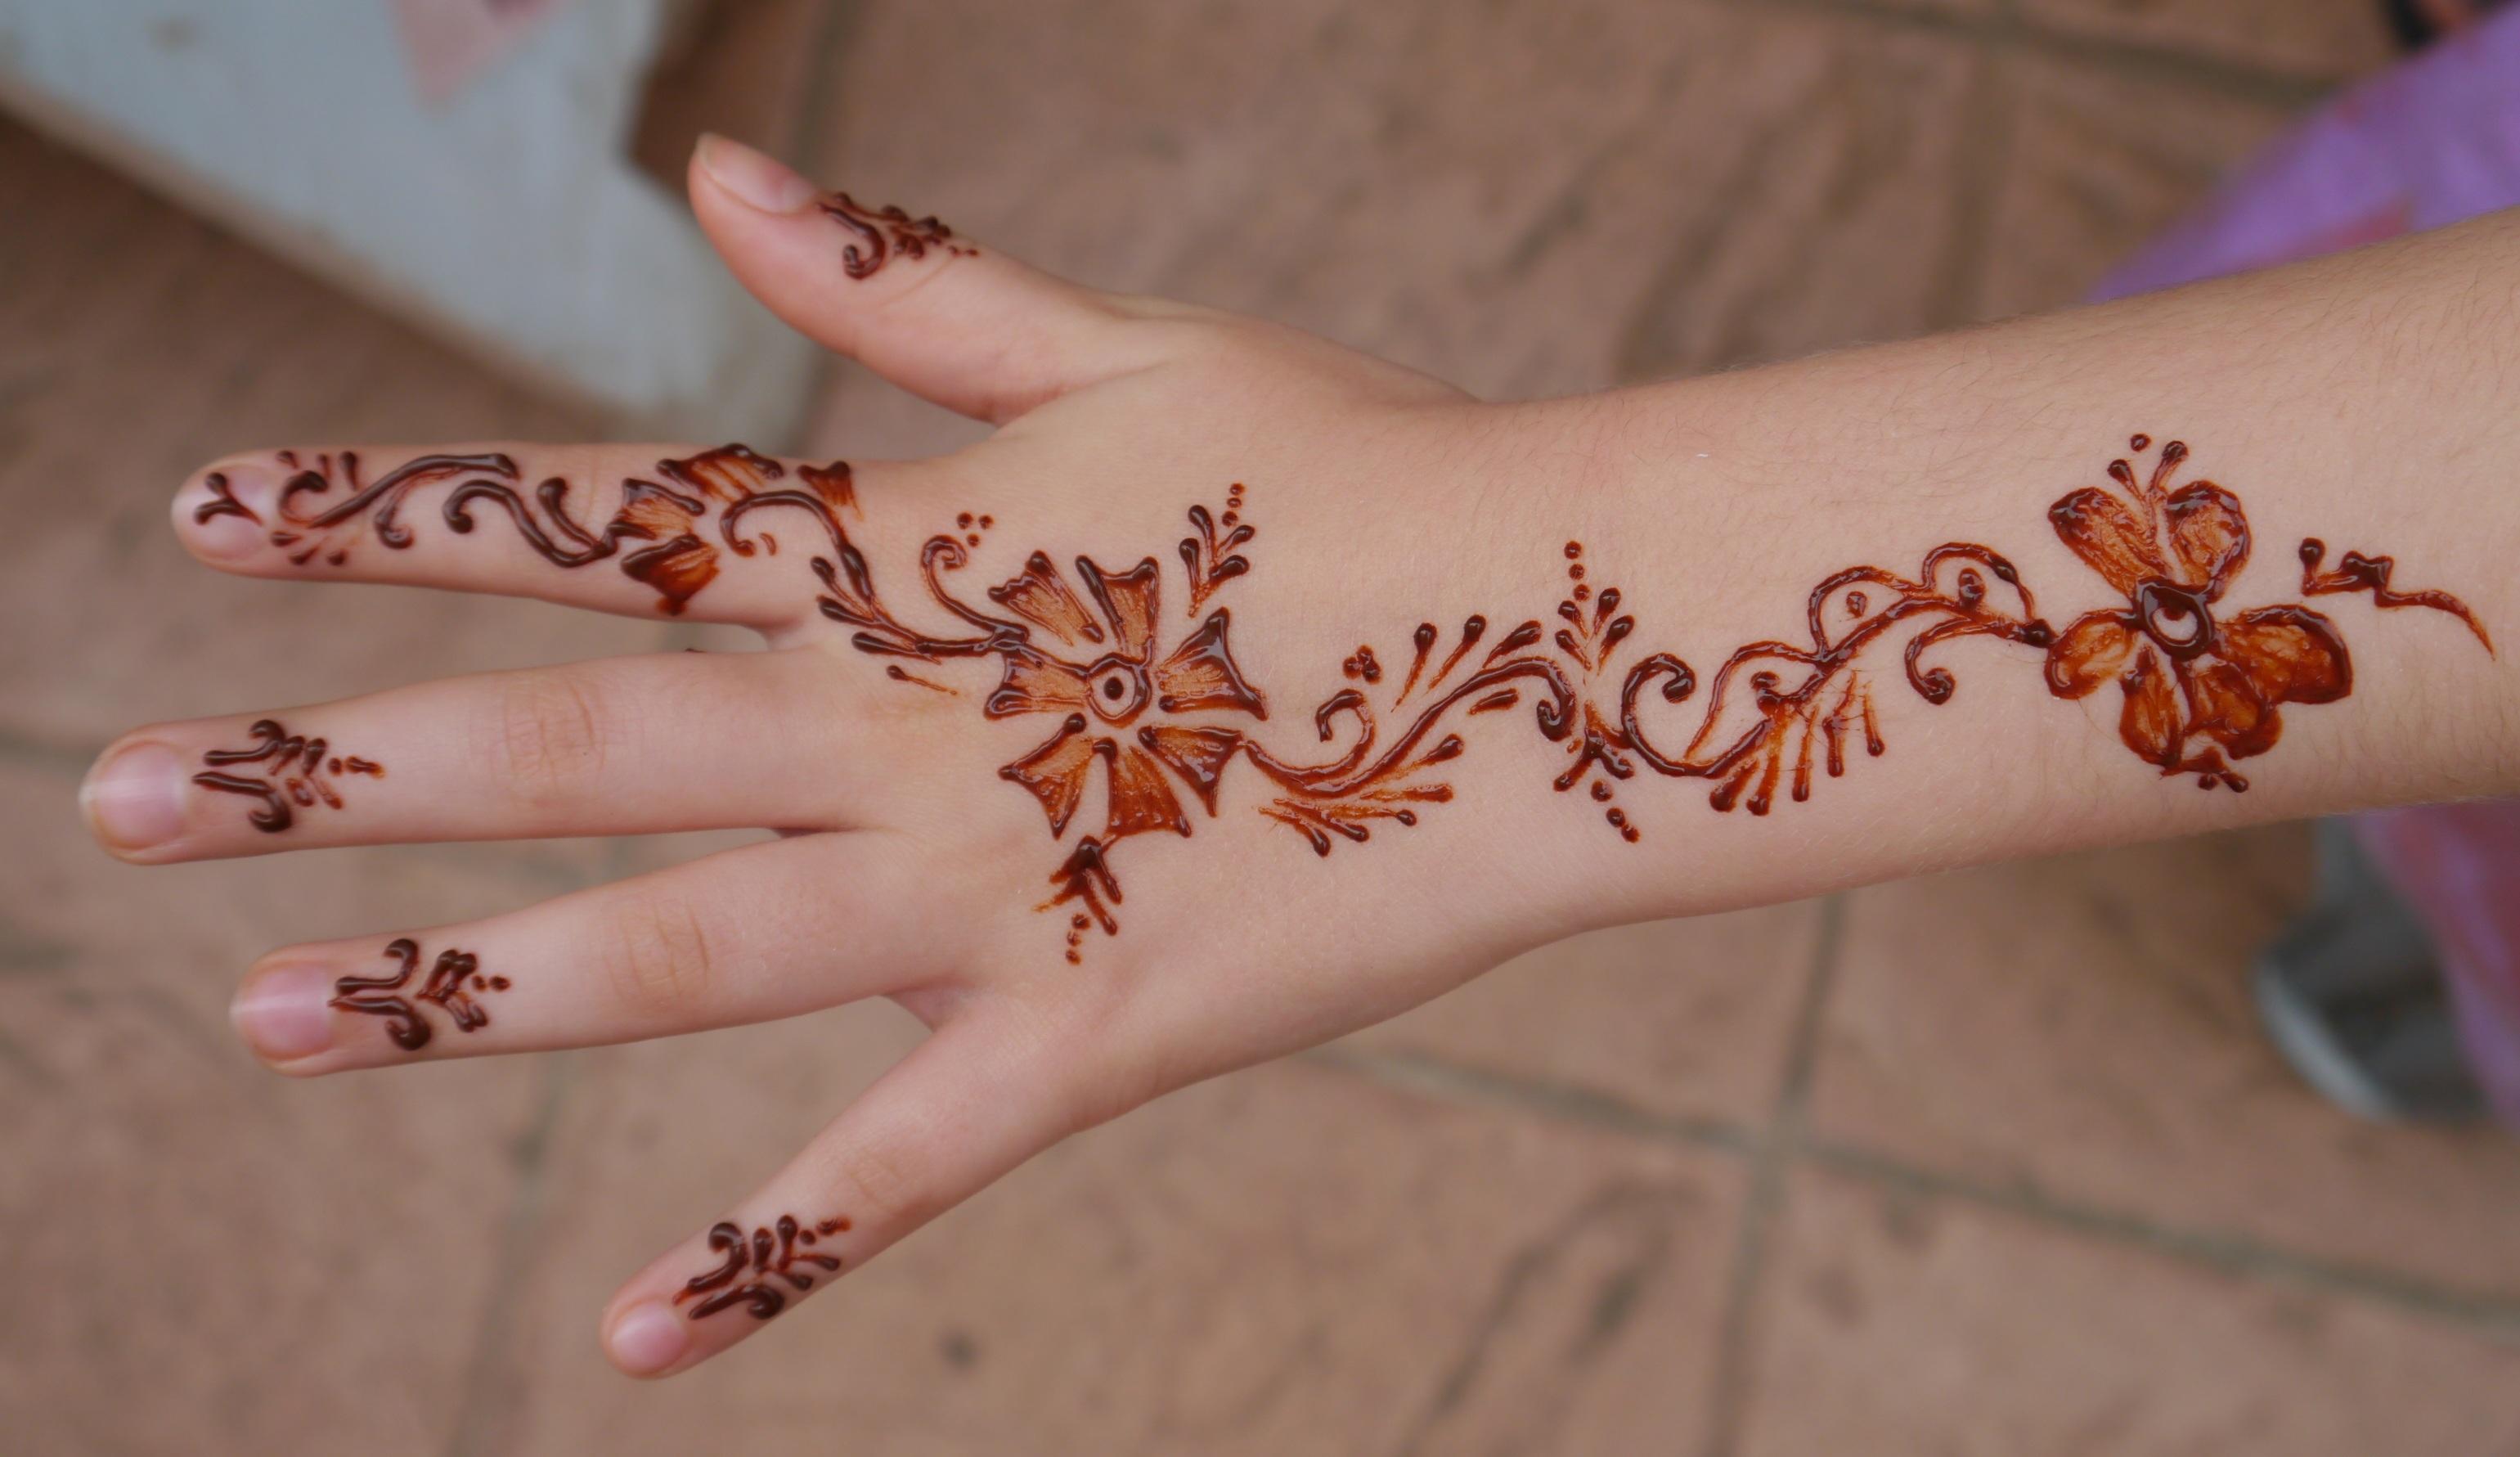 Gambar Tangan Gadis Pola Jari Inai Lengan Lukisan Seni